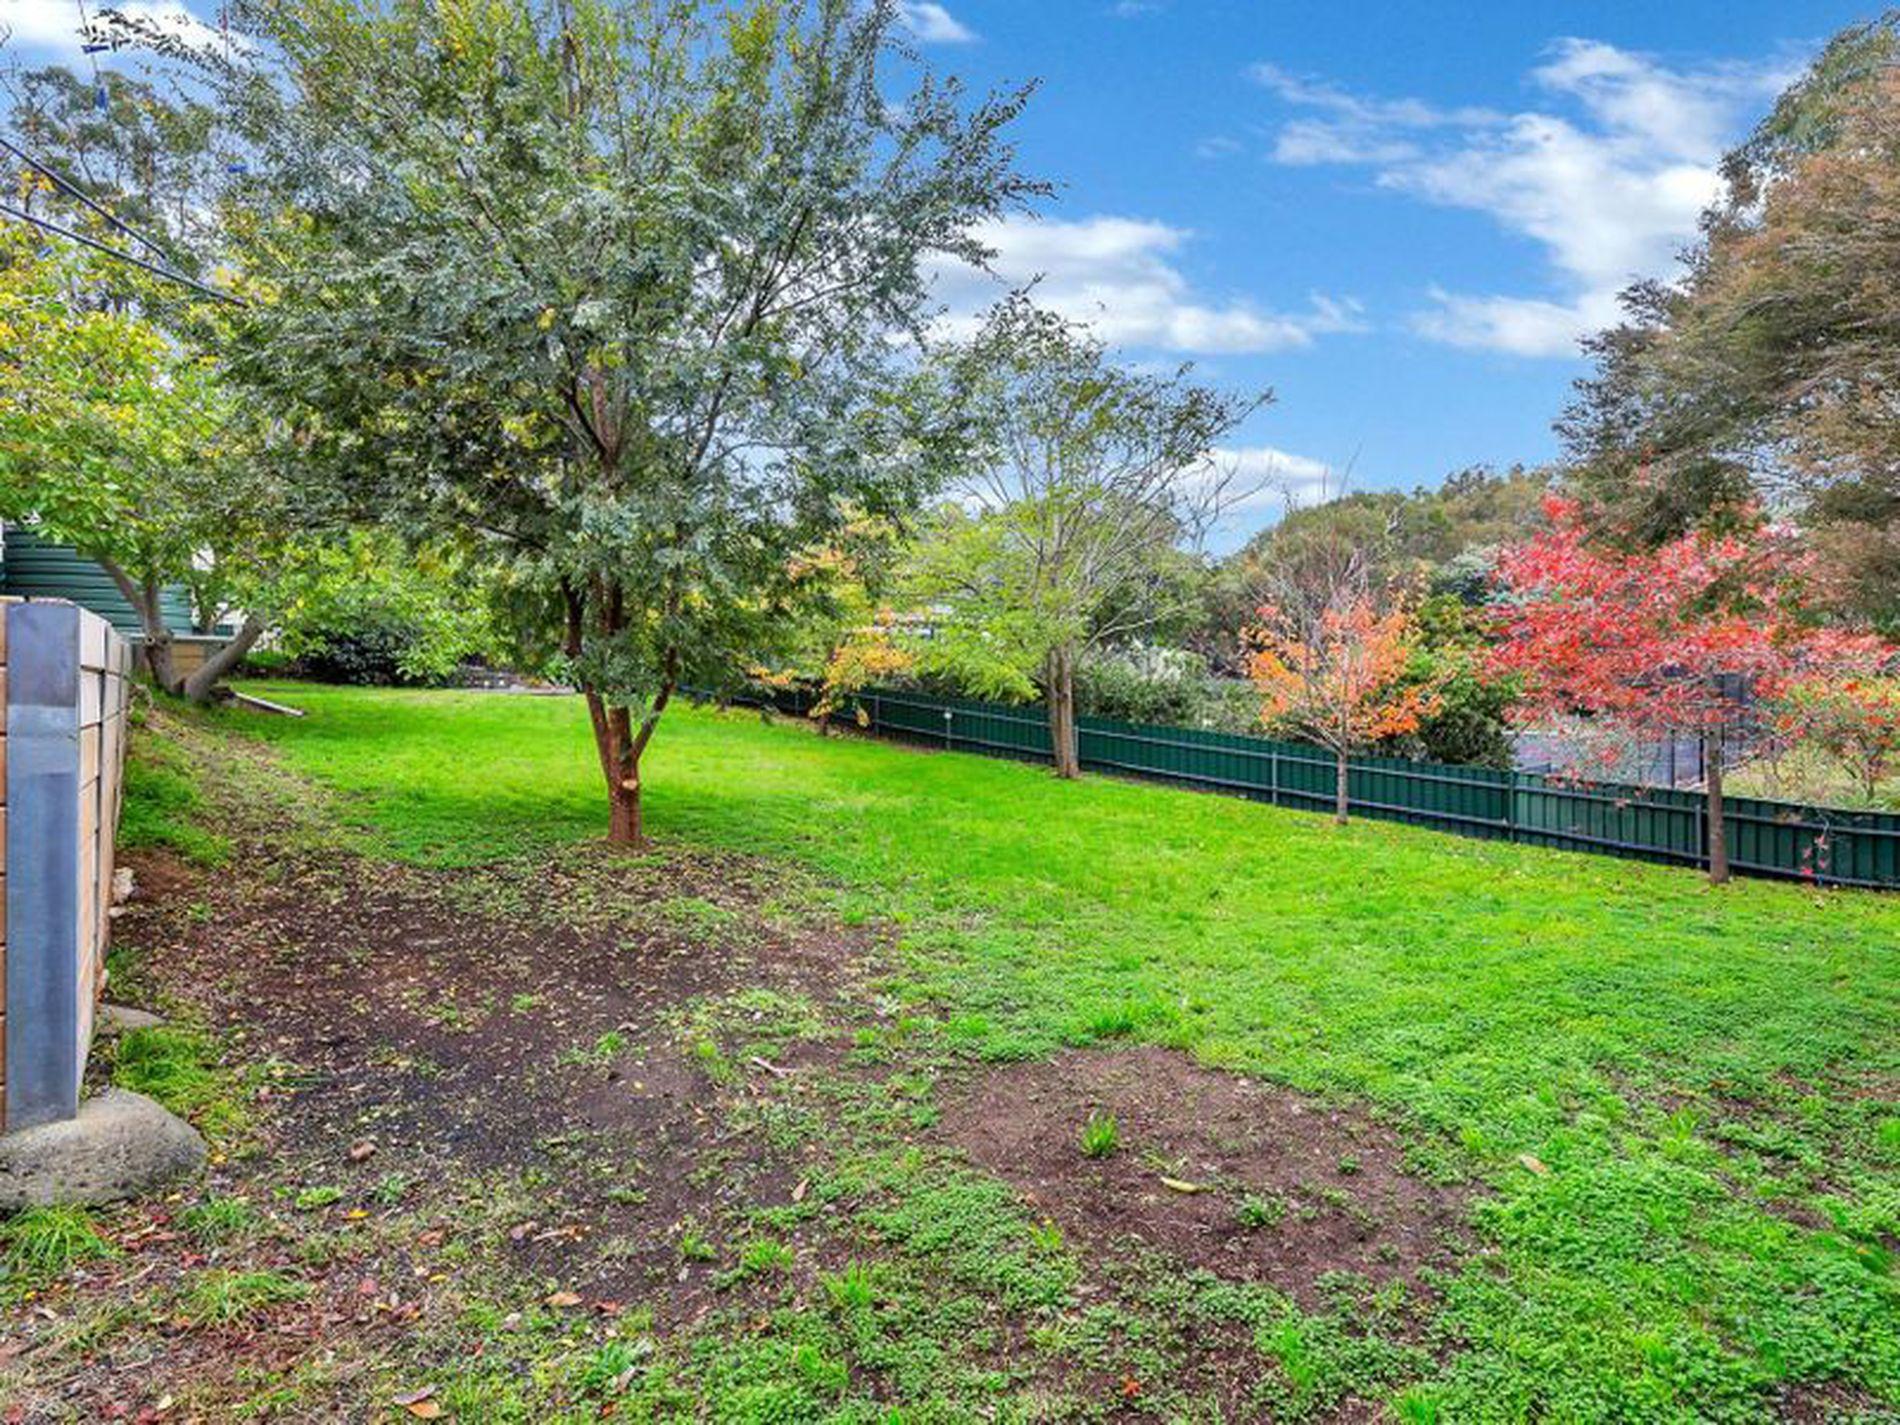 634 Cherry Gardens Road, Cherry Gardens